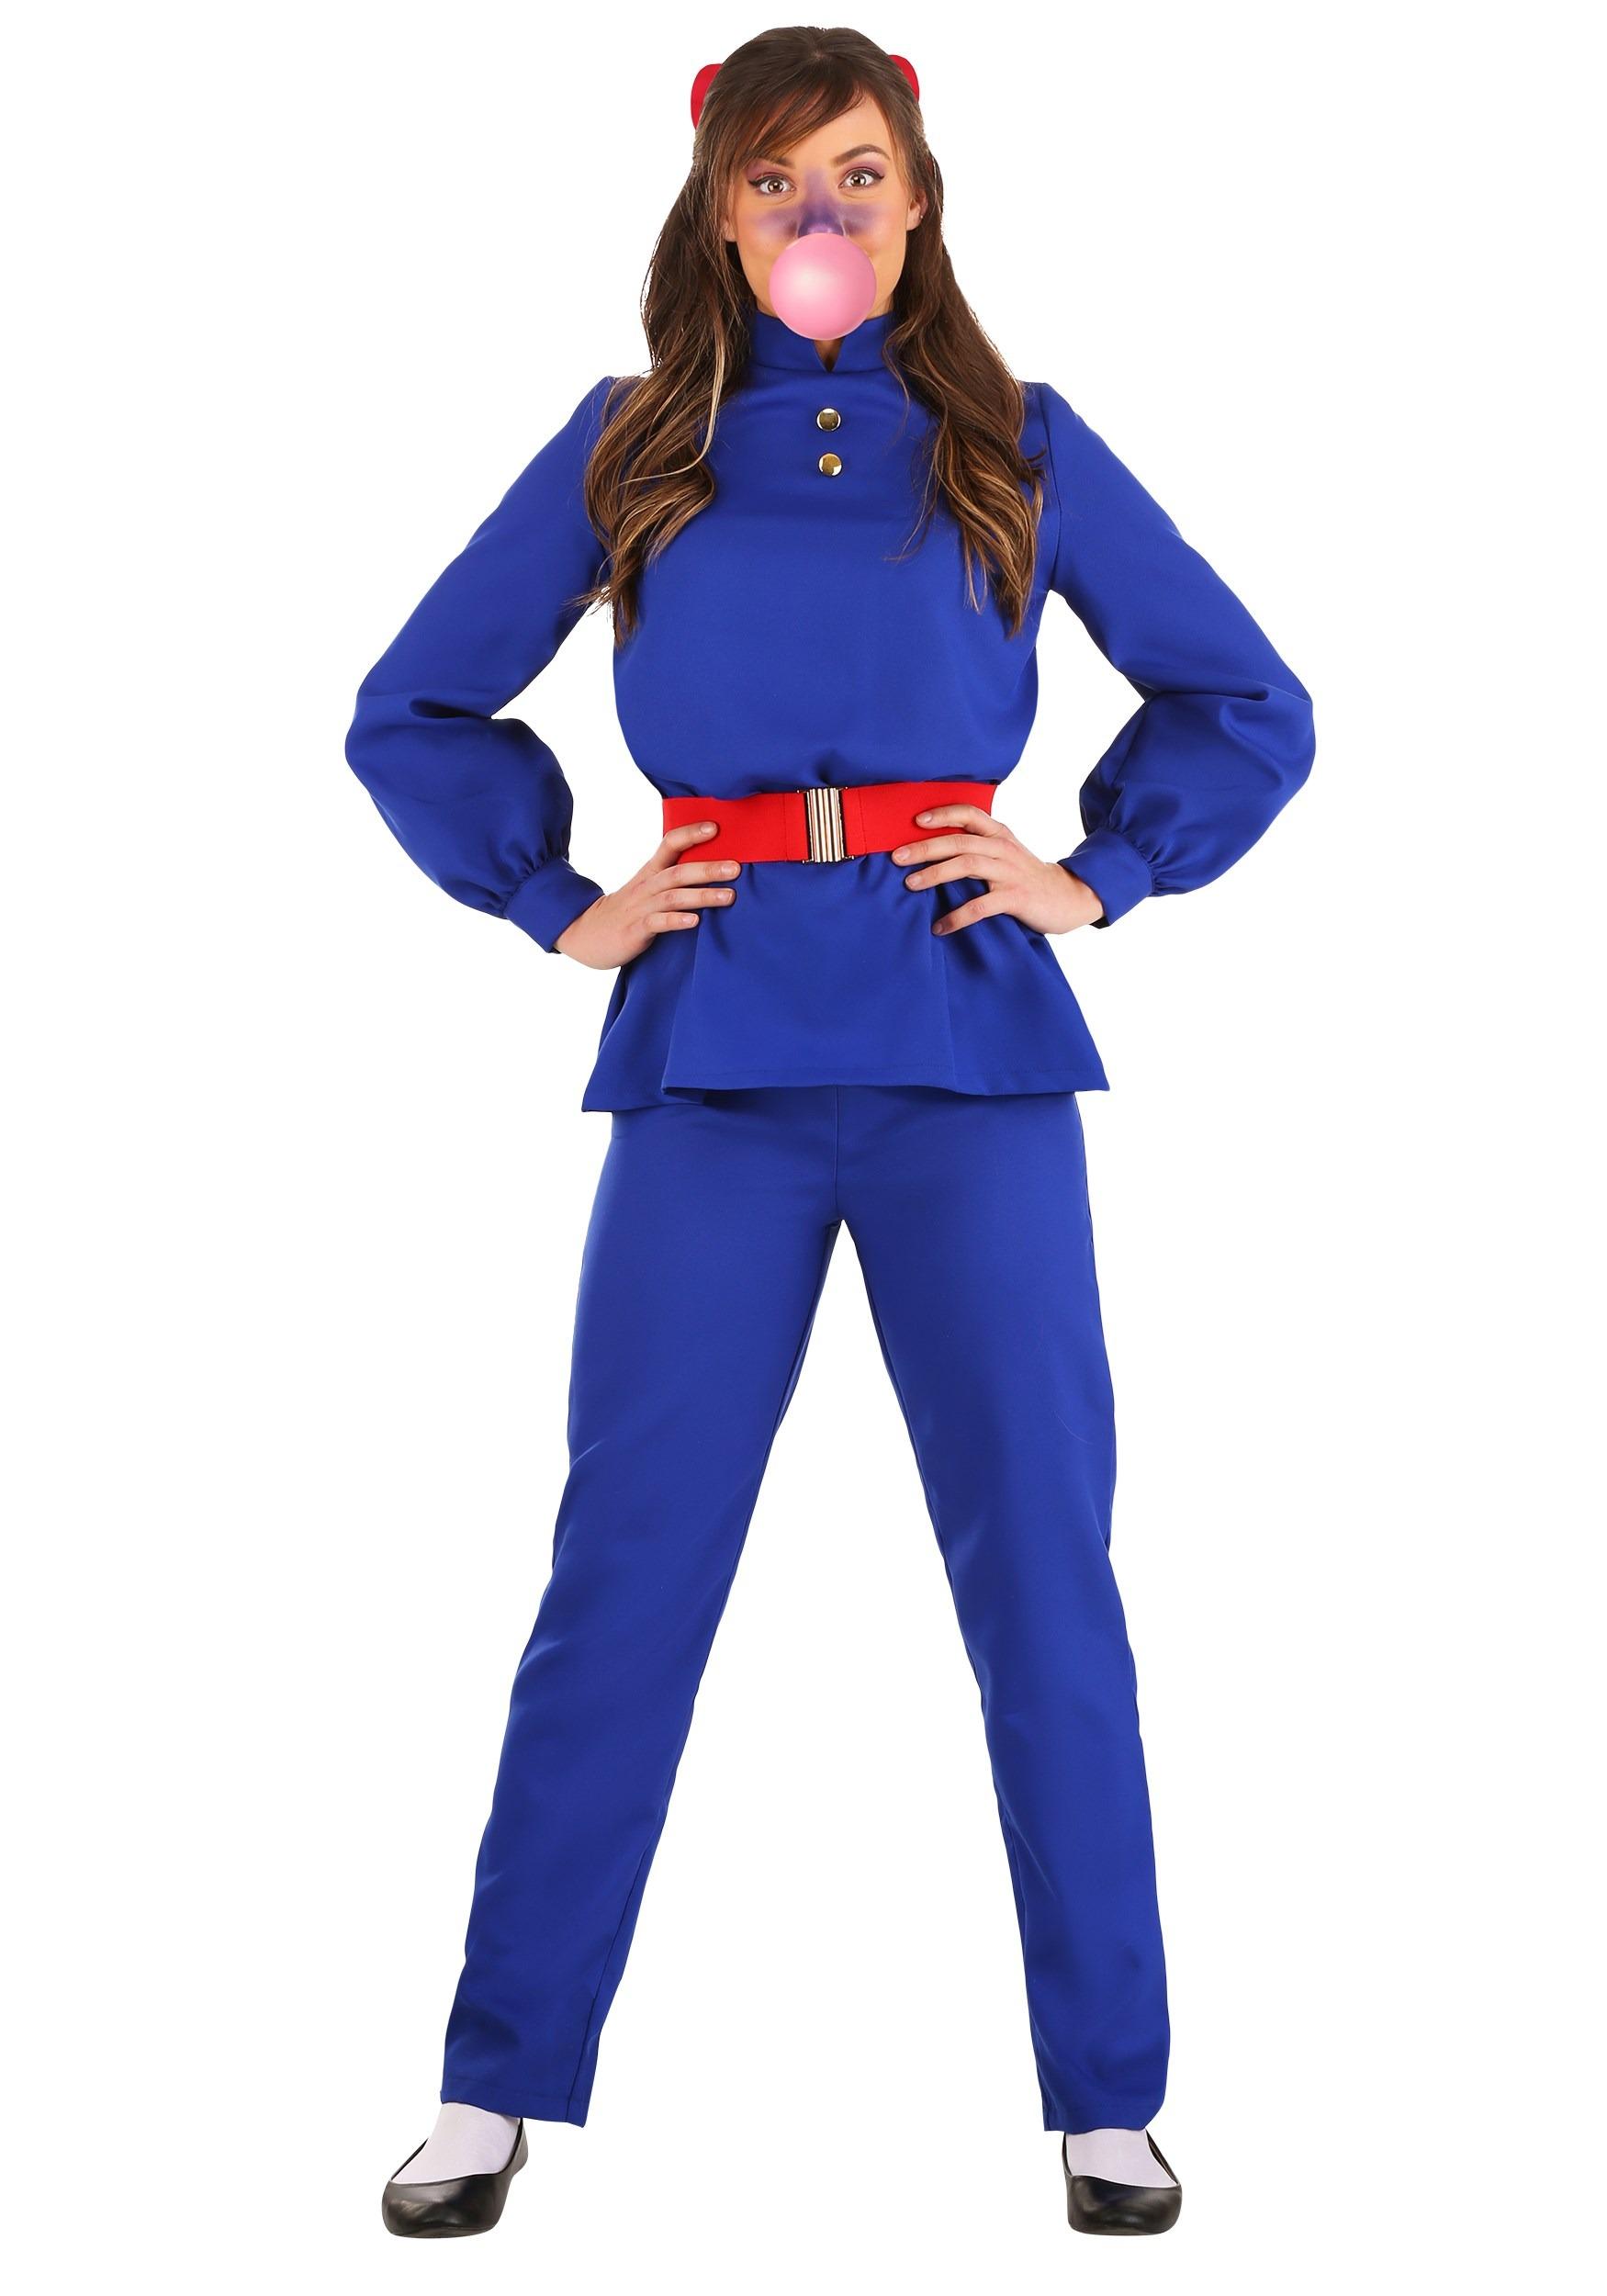 Willy Wonka Violet Beauregarde Women S Costume